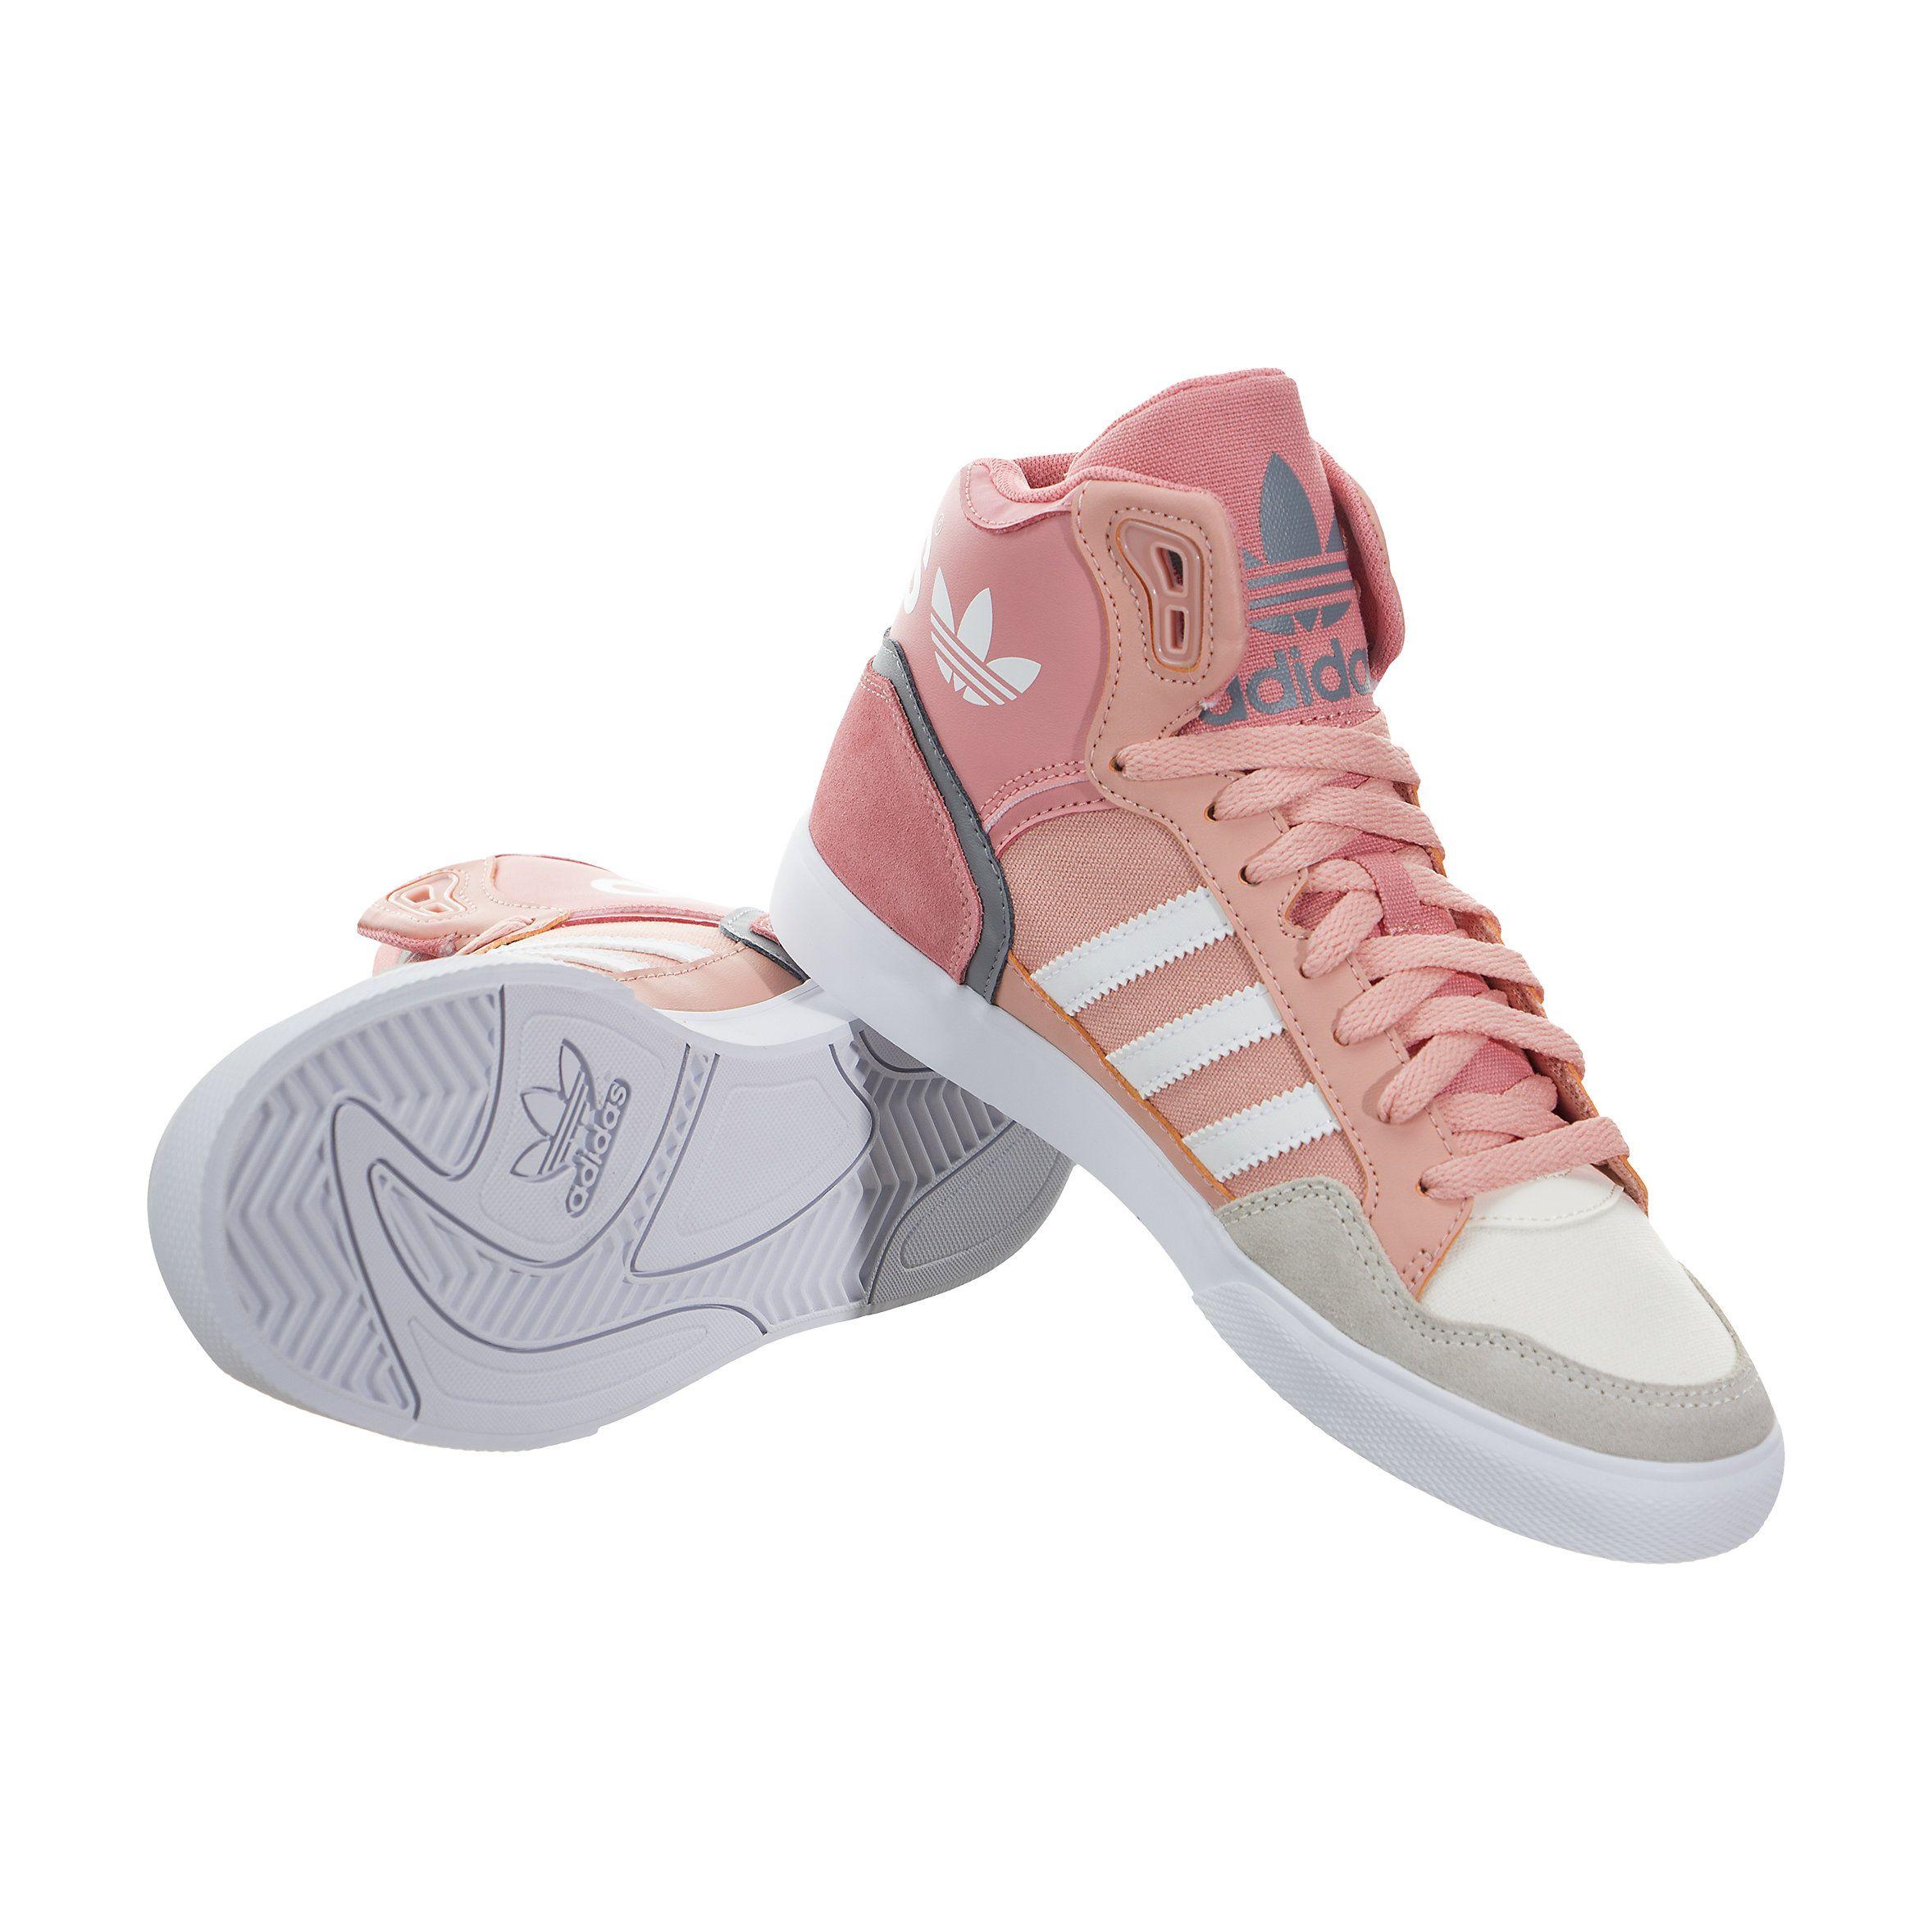 7d36a365e36e Reebok LES MILLS UR Tempo Mid 3.0 TX - Royal Orchid | Reebok US | Fitness  on Fleek | Sneakers nike, Jordans sneakers, Air jordans